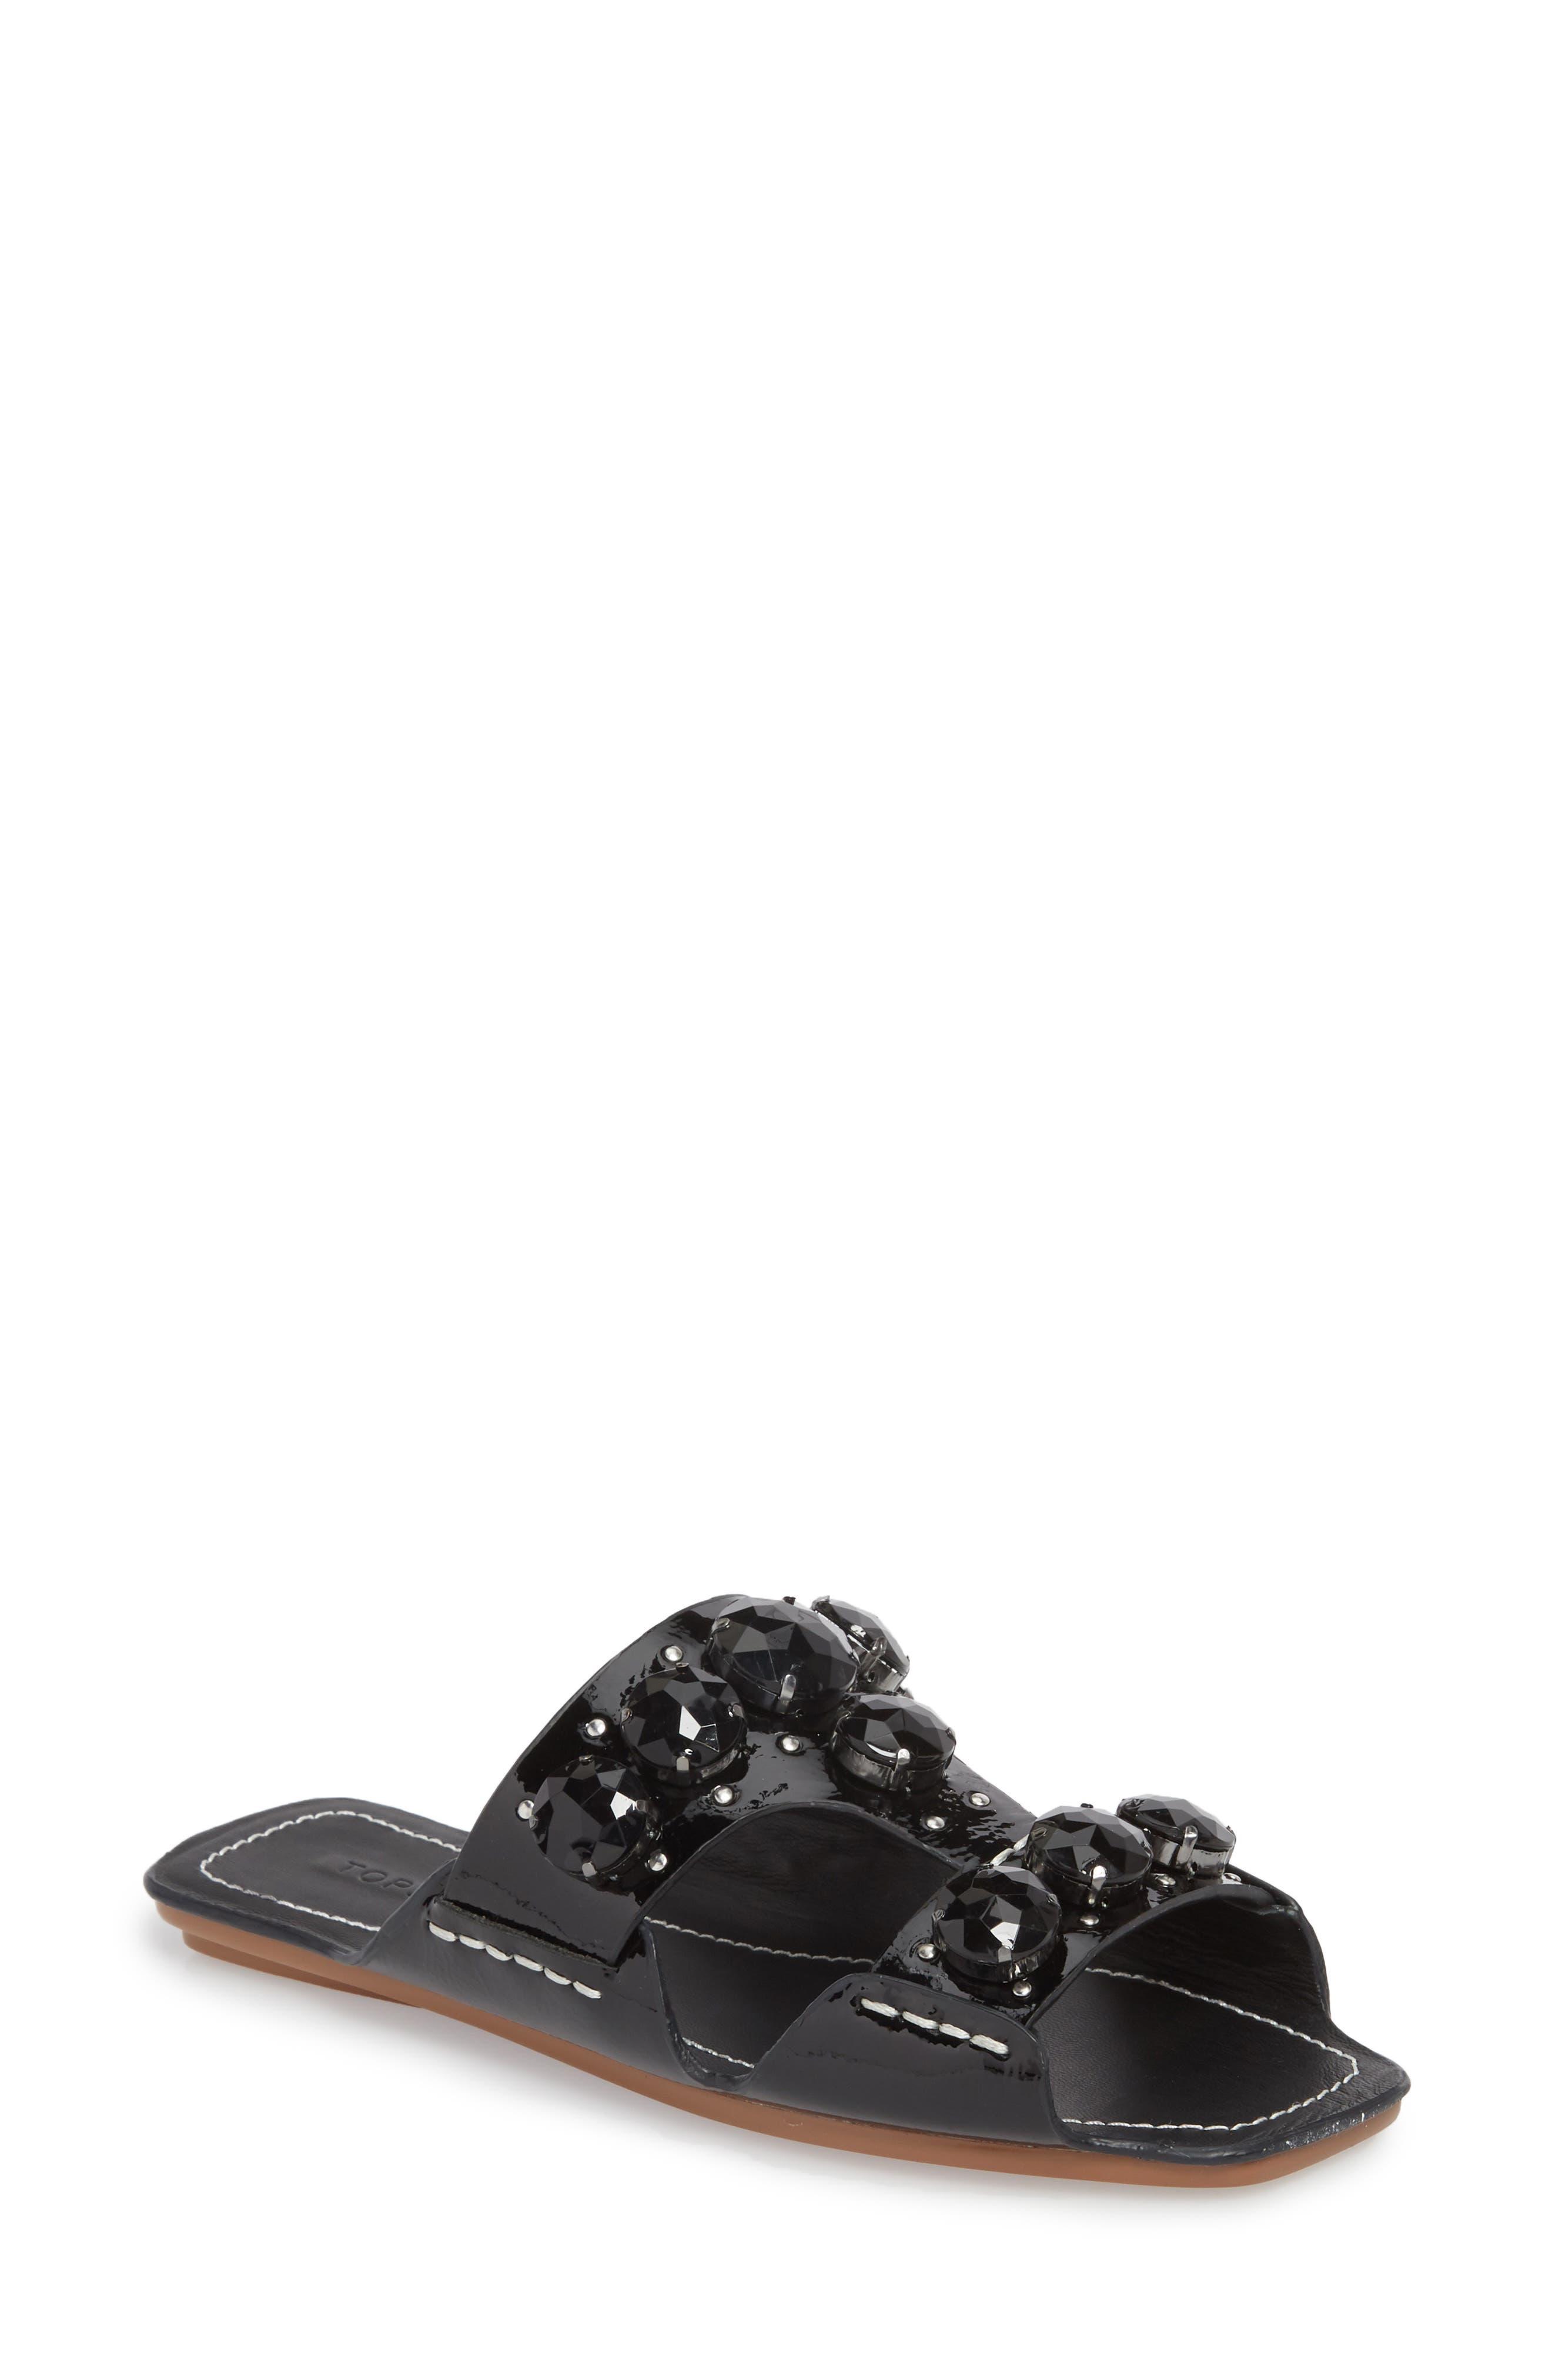 Fascinate Gem Slide Sandal,                             Main thumbnail 1, color,                             BLACK